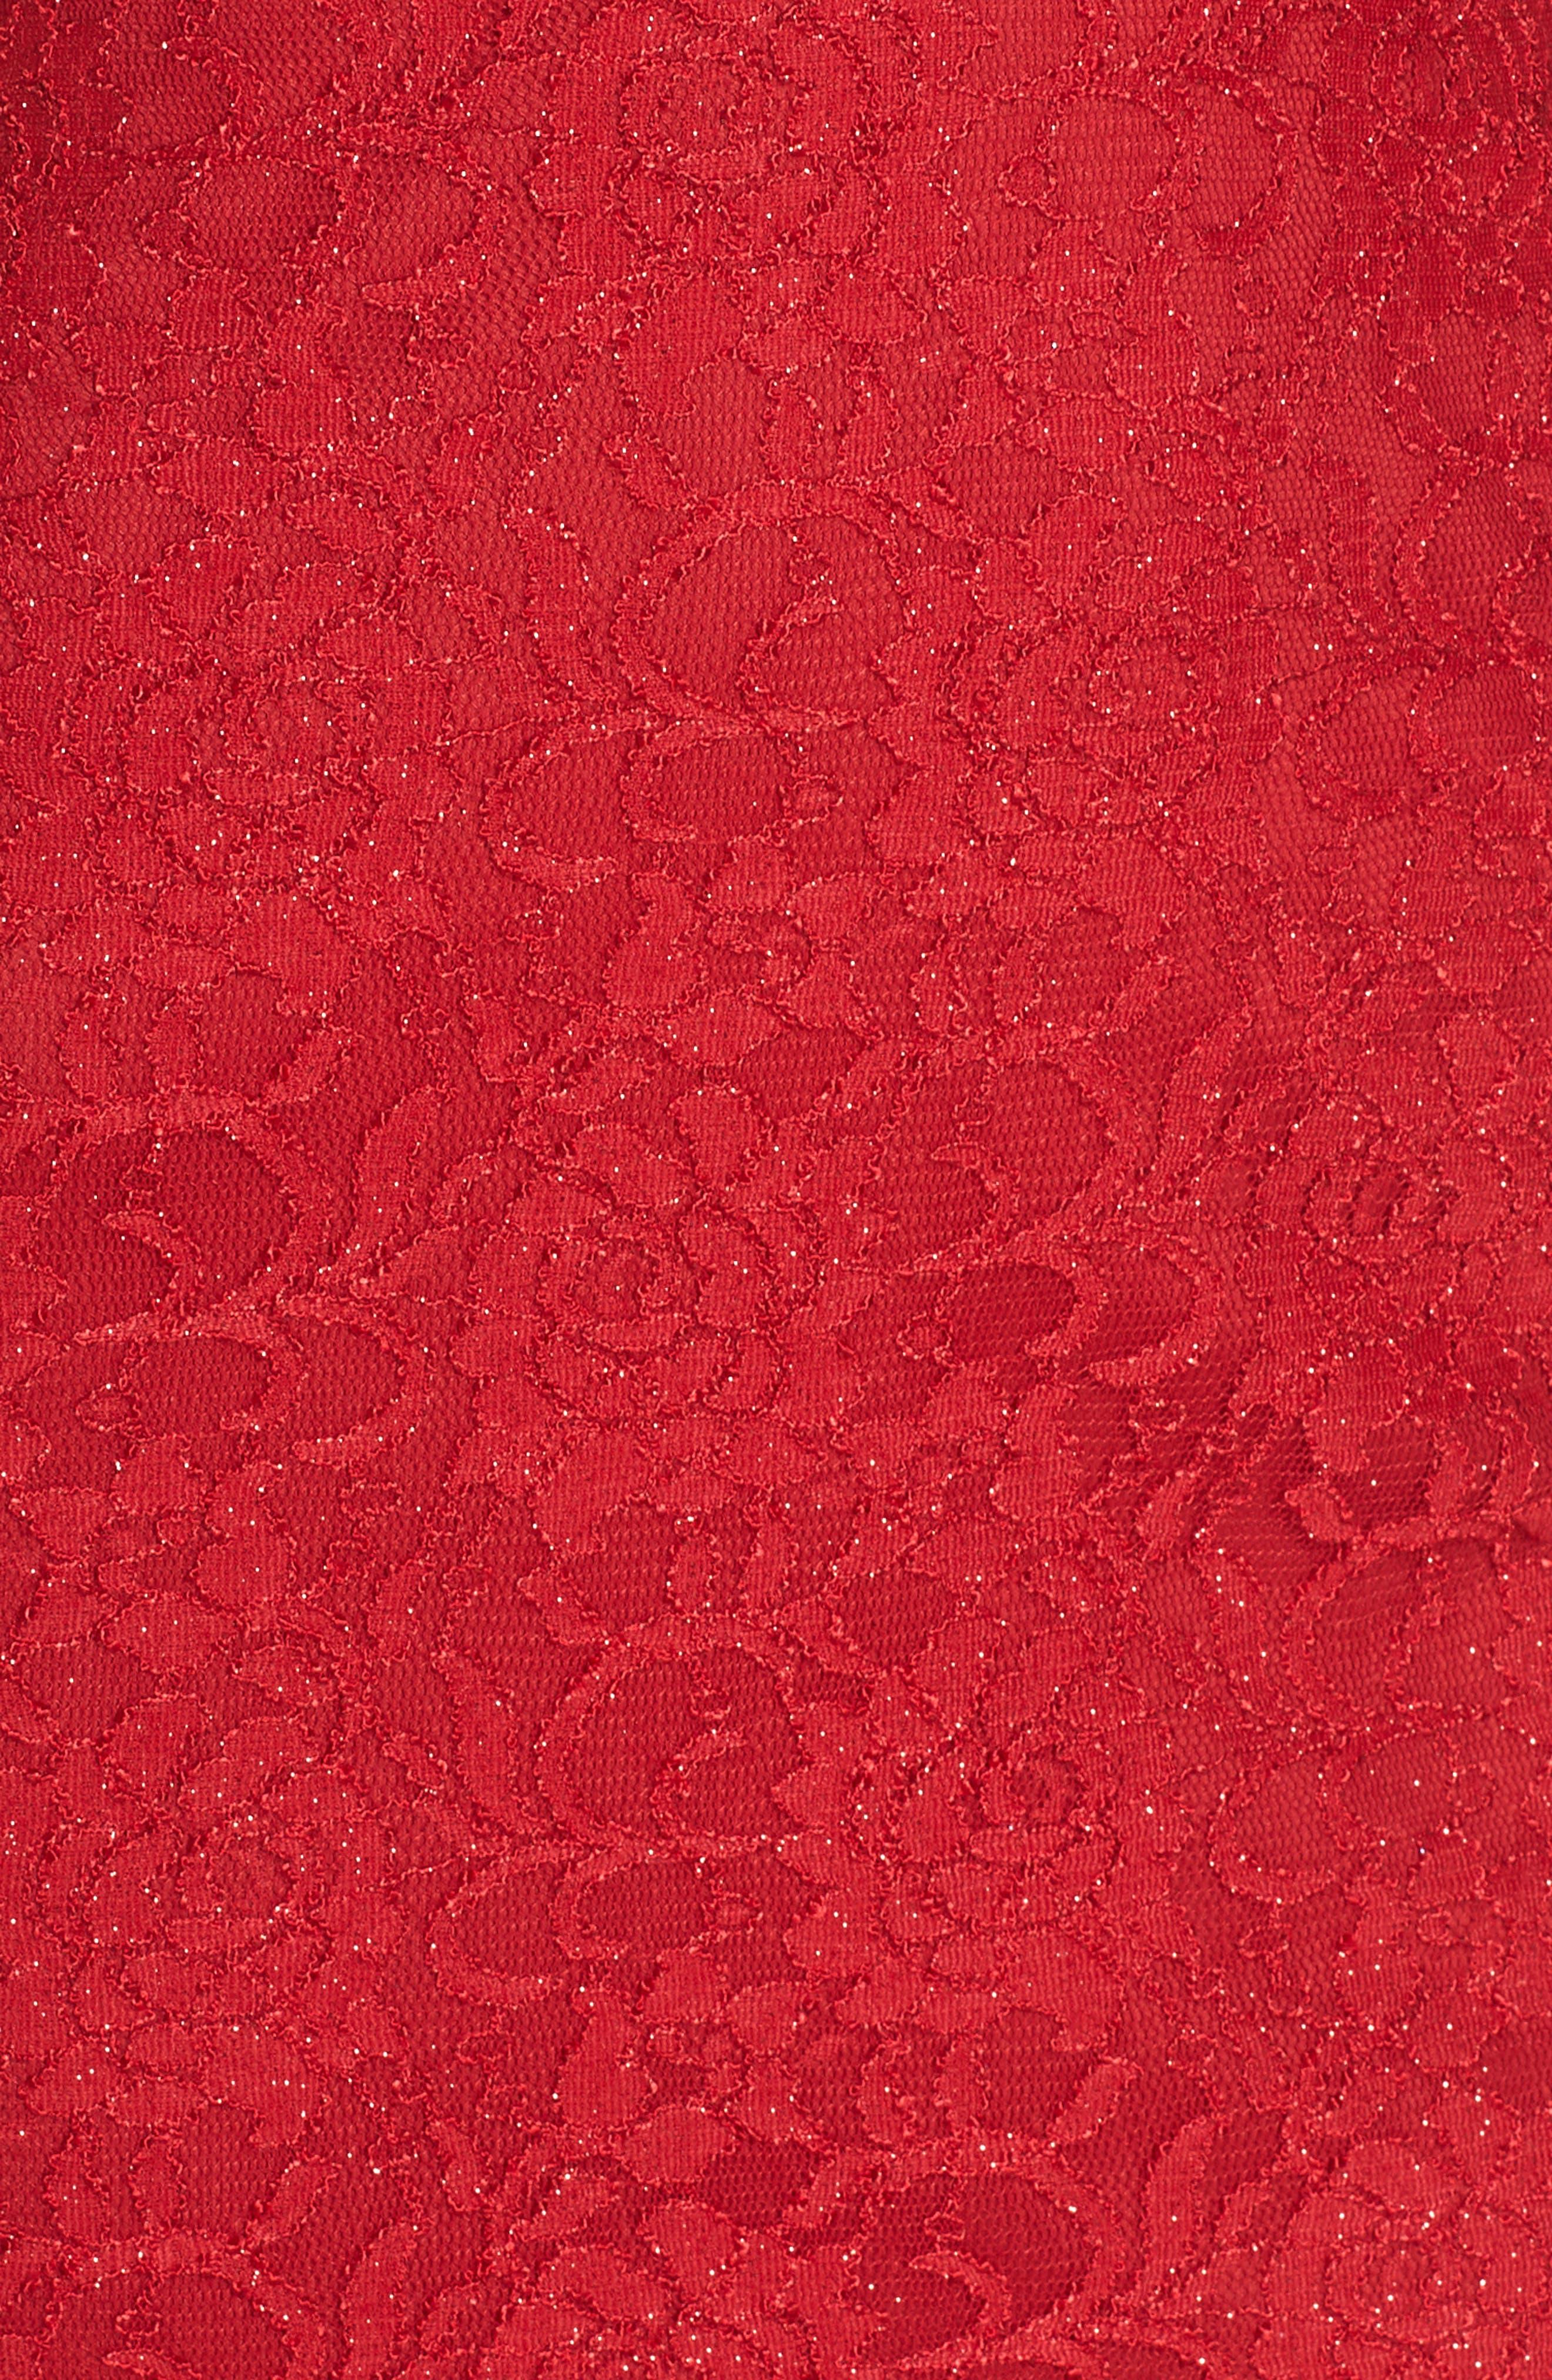 Sleeveless Glitter Lace Sheath Dress,                             Alternate thumbnail 6, color,                             RE RED